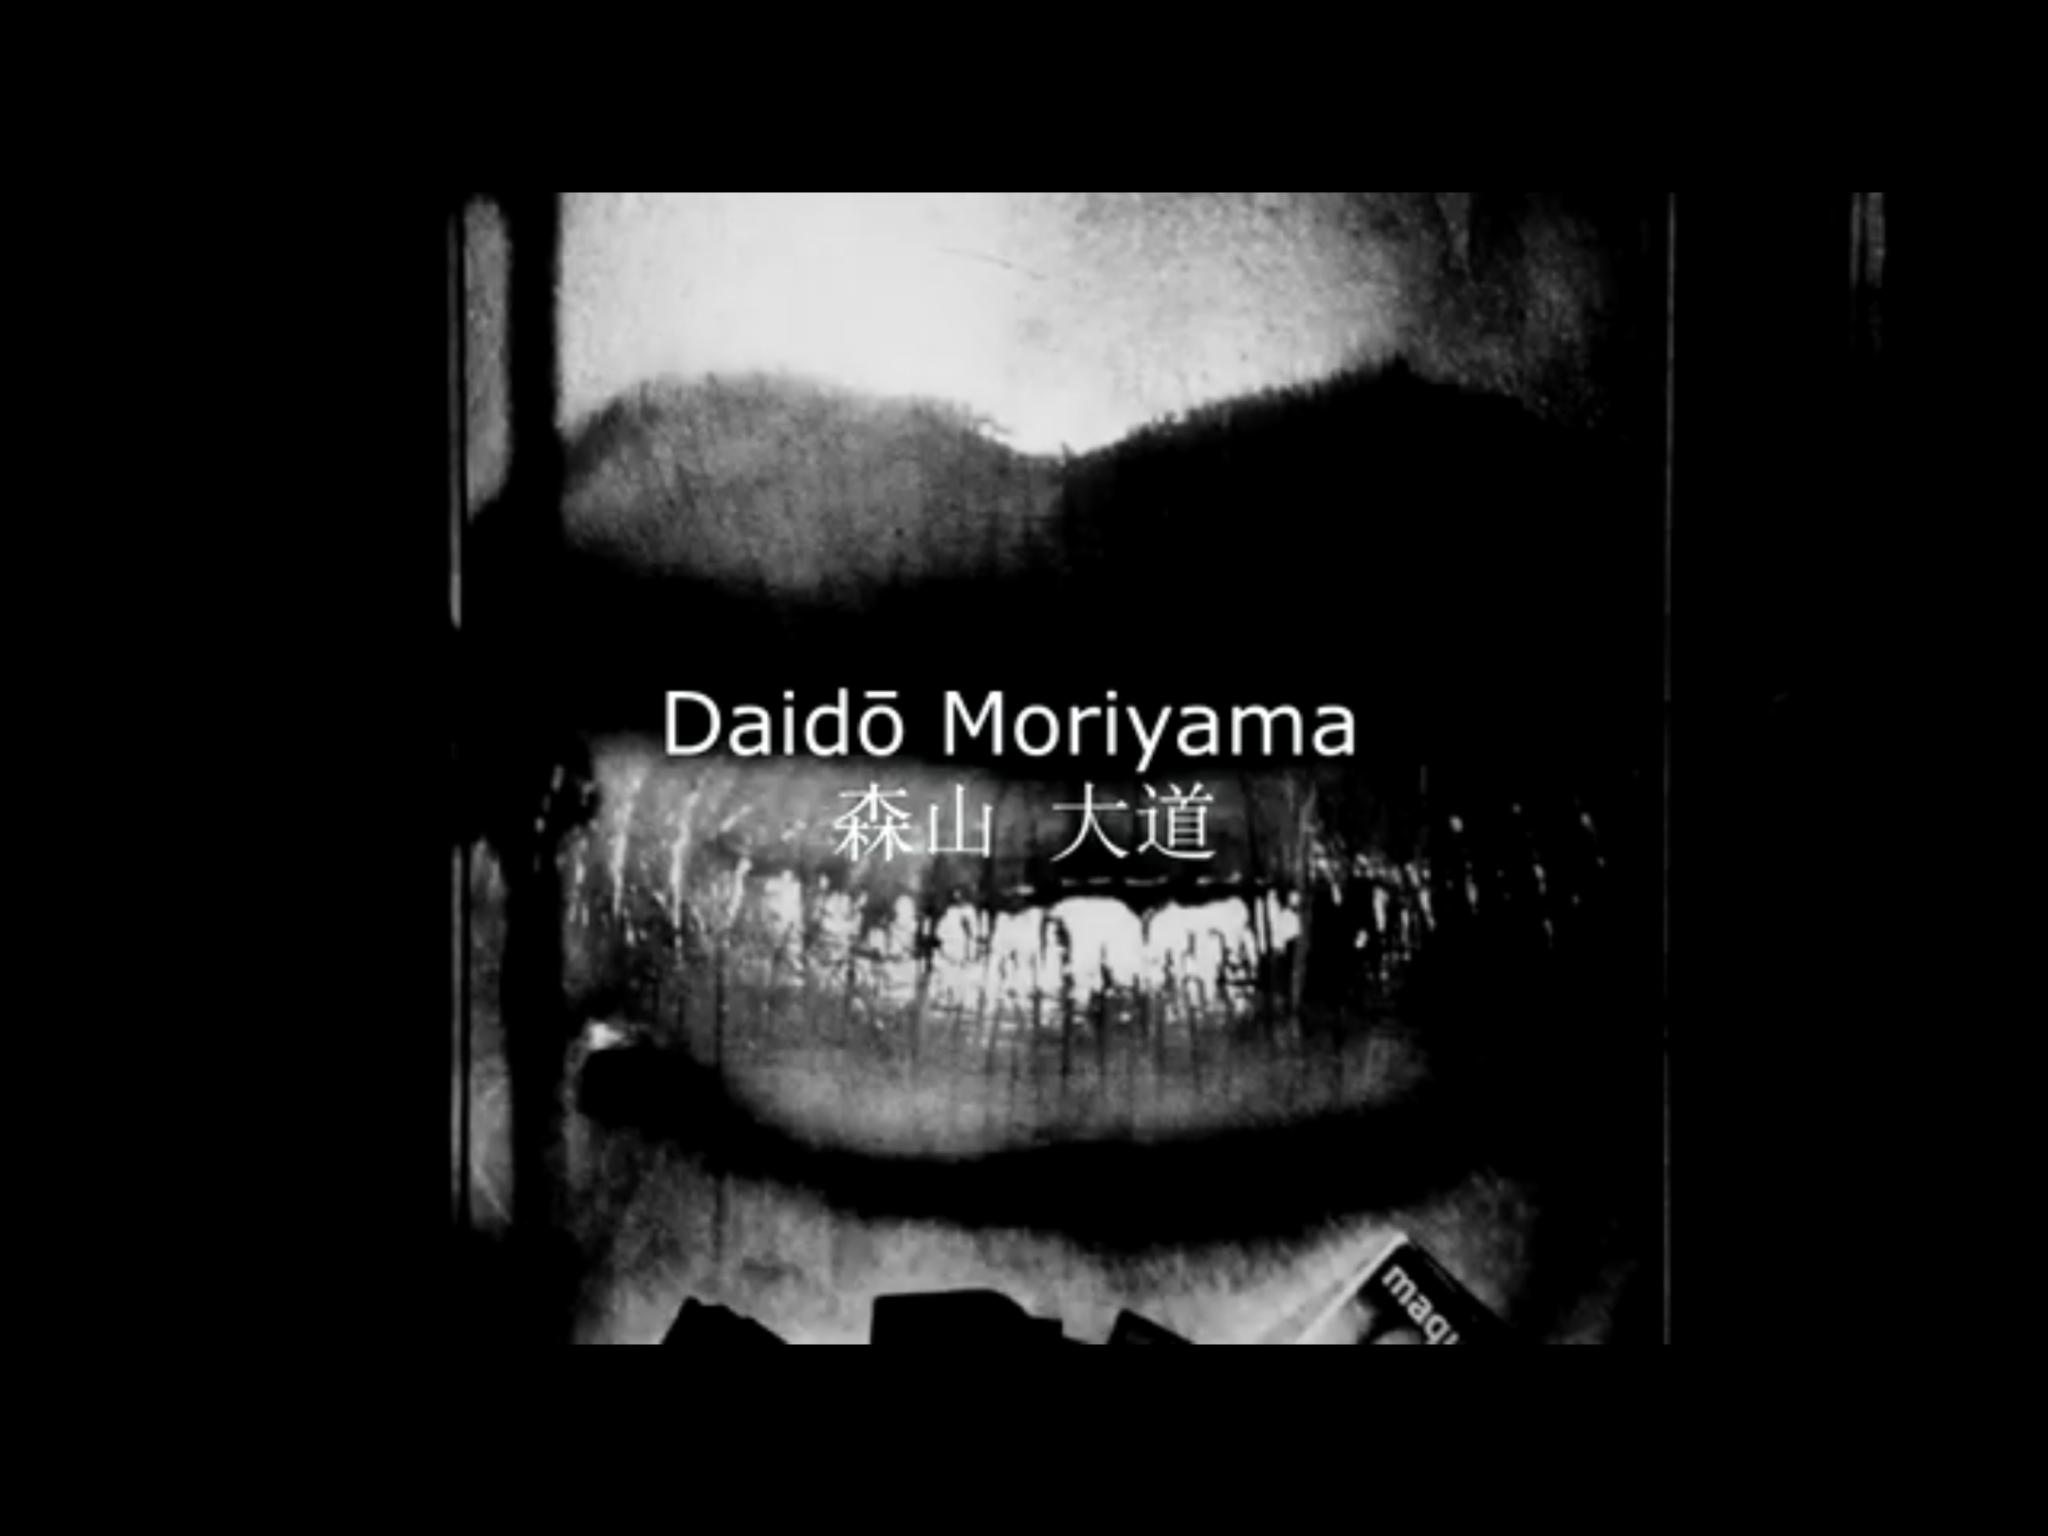 Daido Moriyama is a Wealth of Gritty Street Photography Inspiration